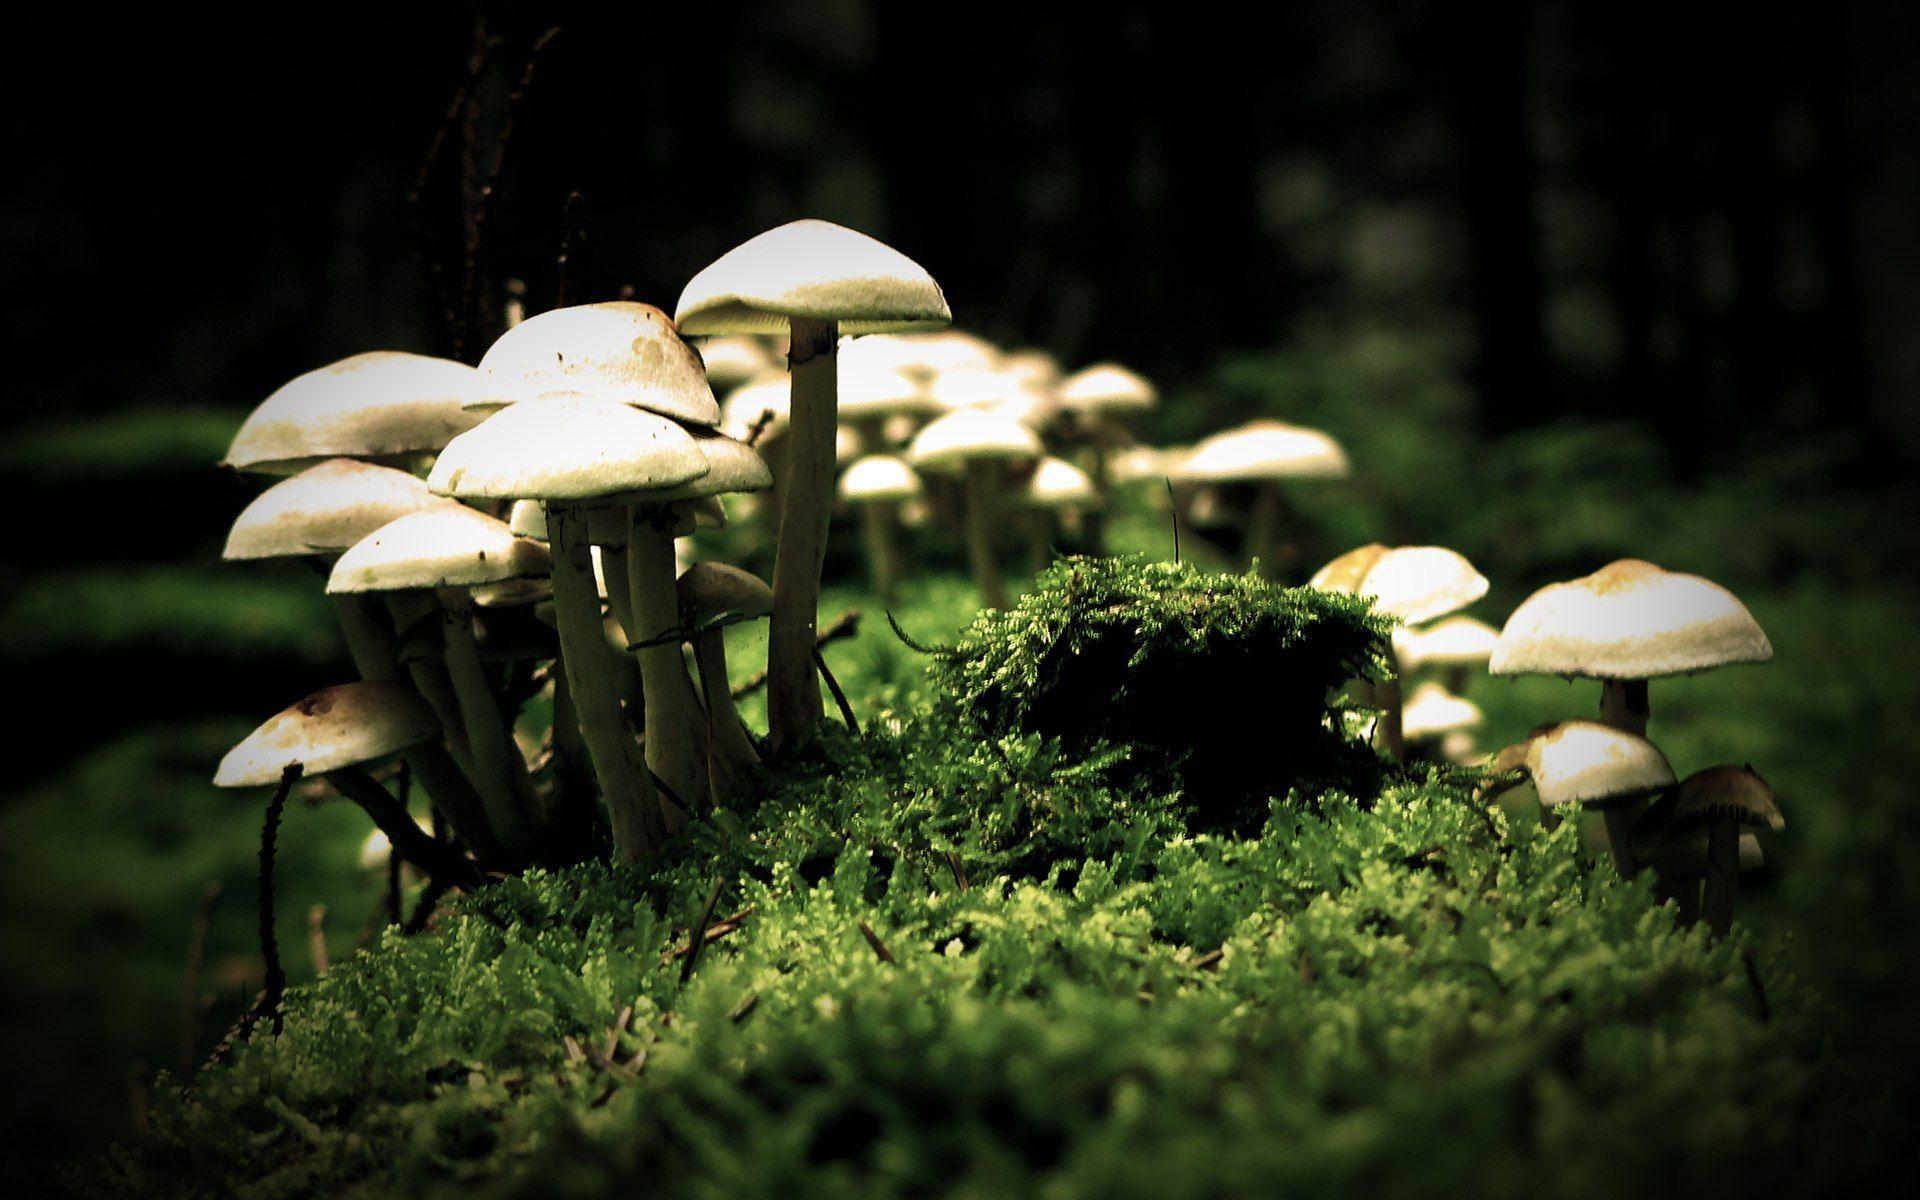 mushroom pictures images